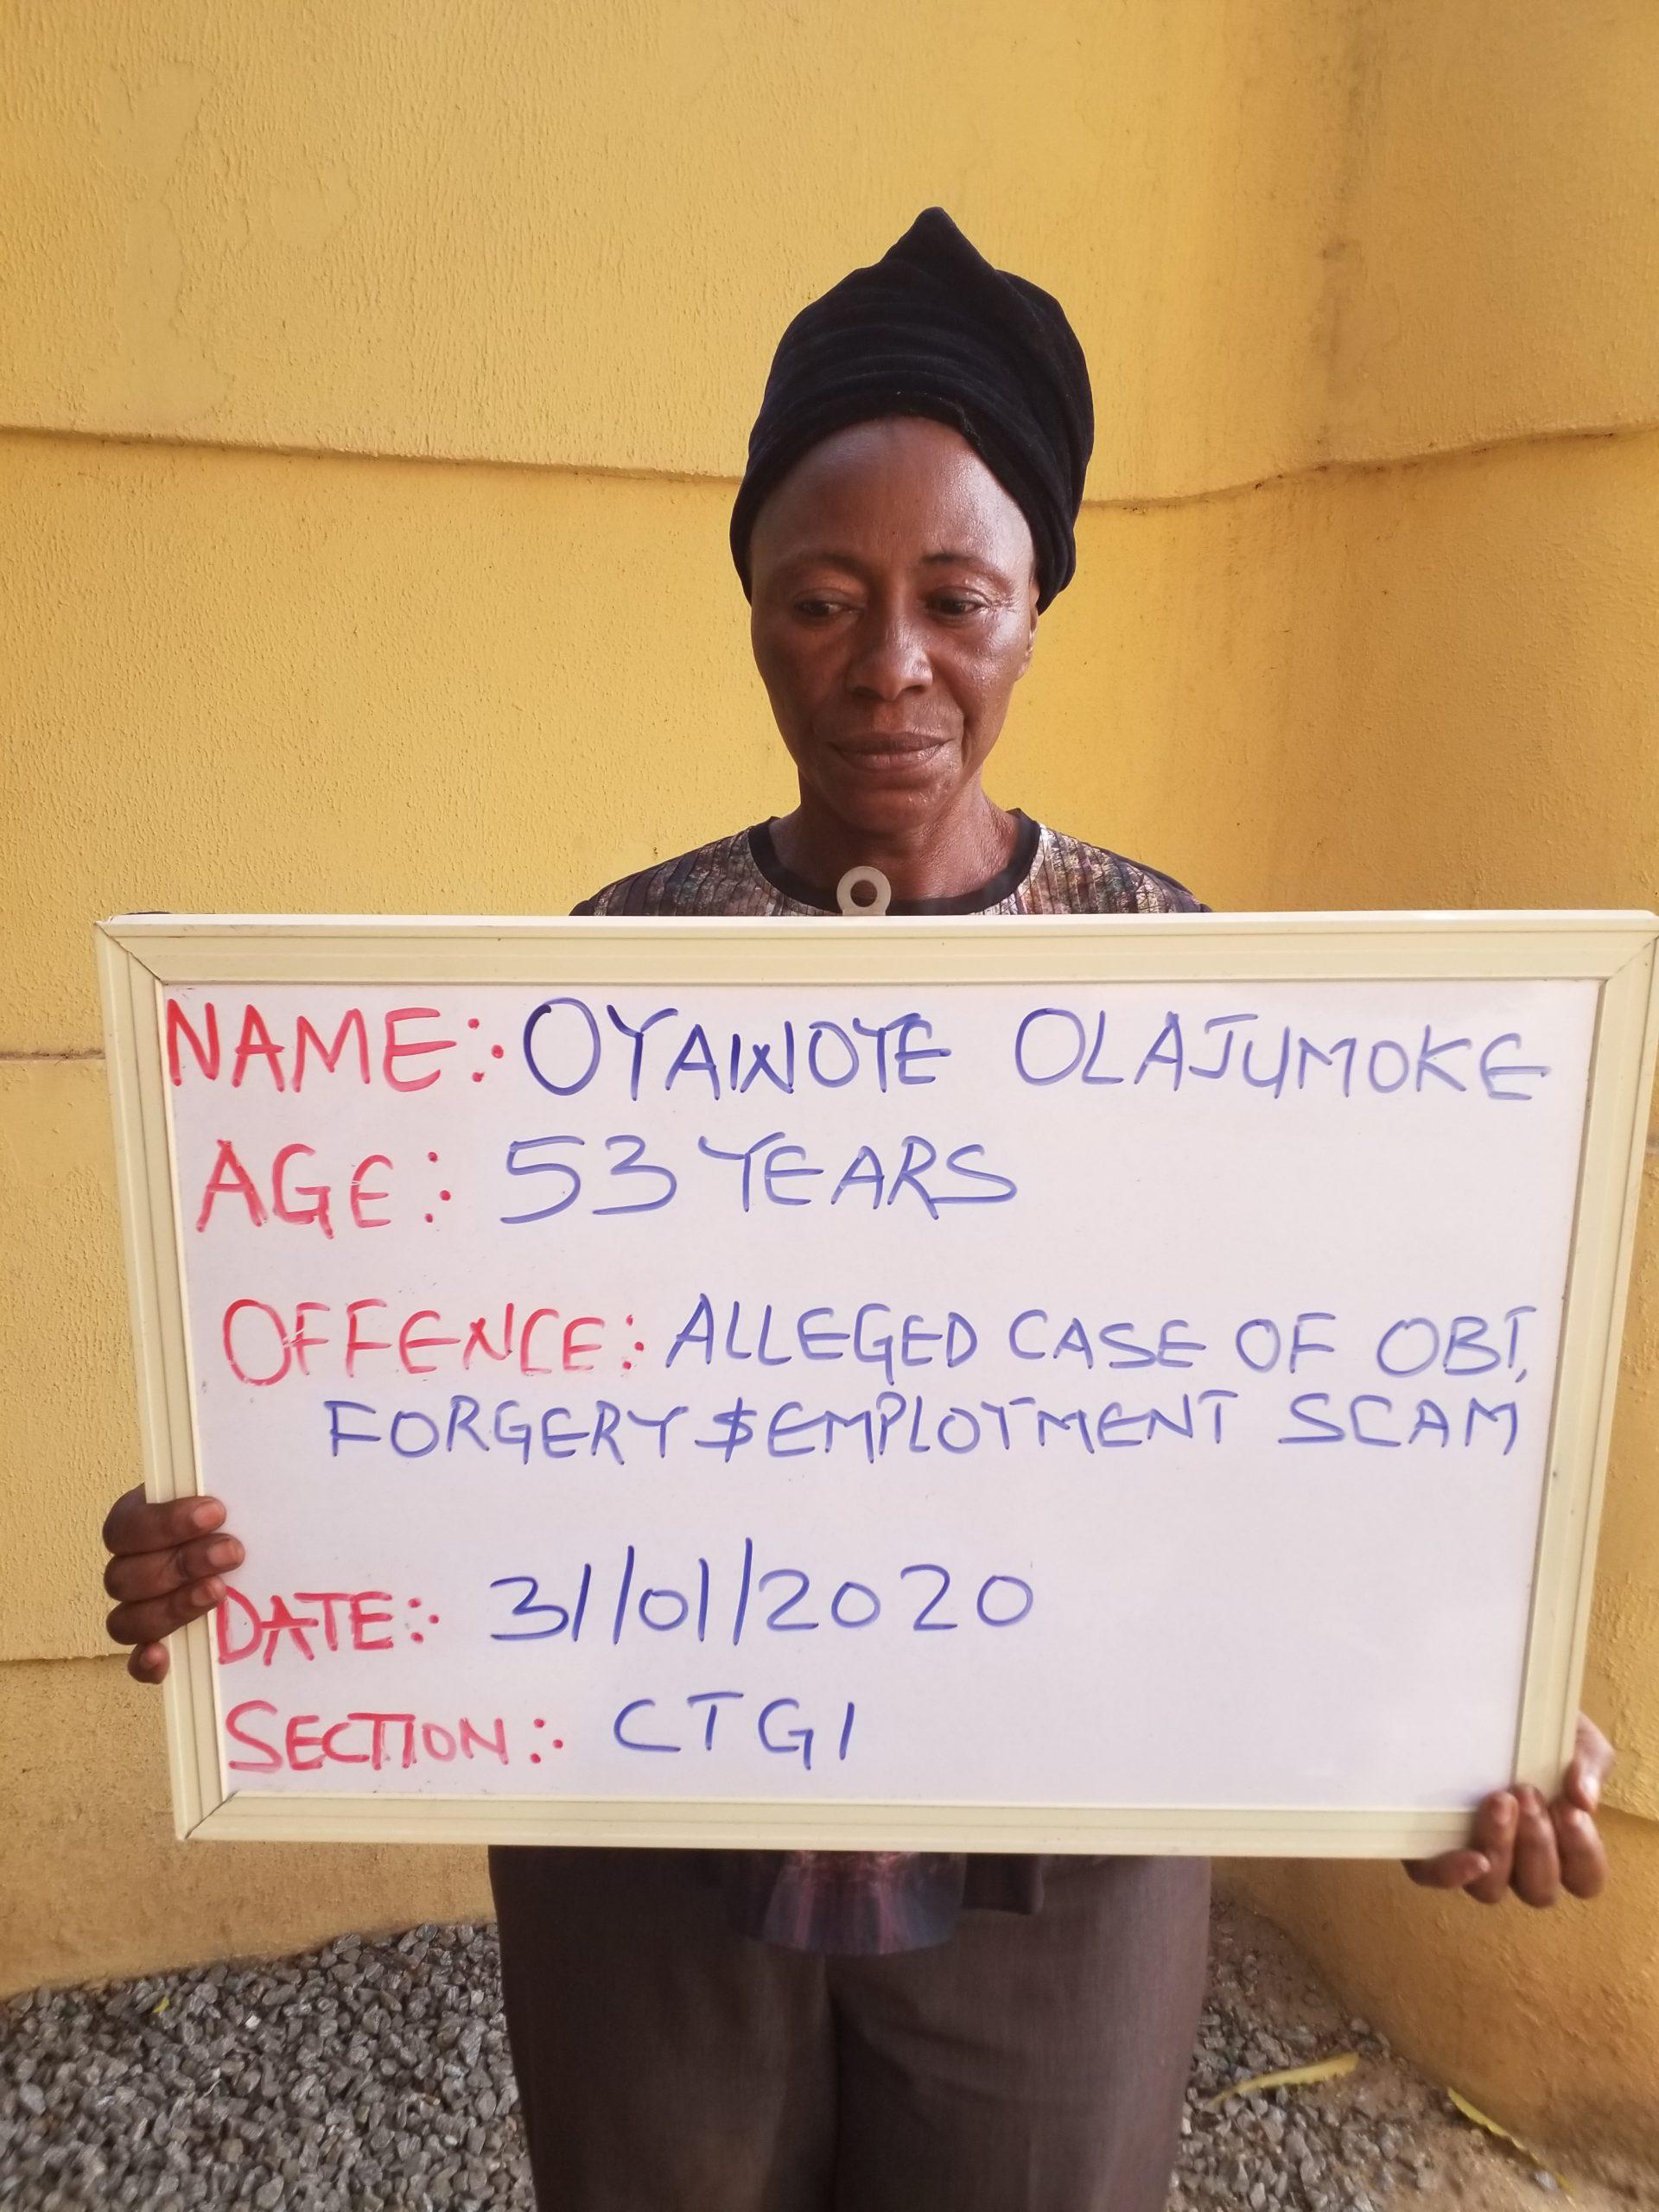 Kwara Civil Servant Sets Up Fake Employment Agency, Read Details Of Her Scam, Her Arrest + Photo